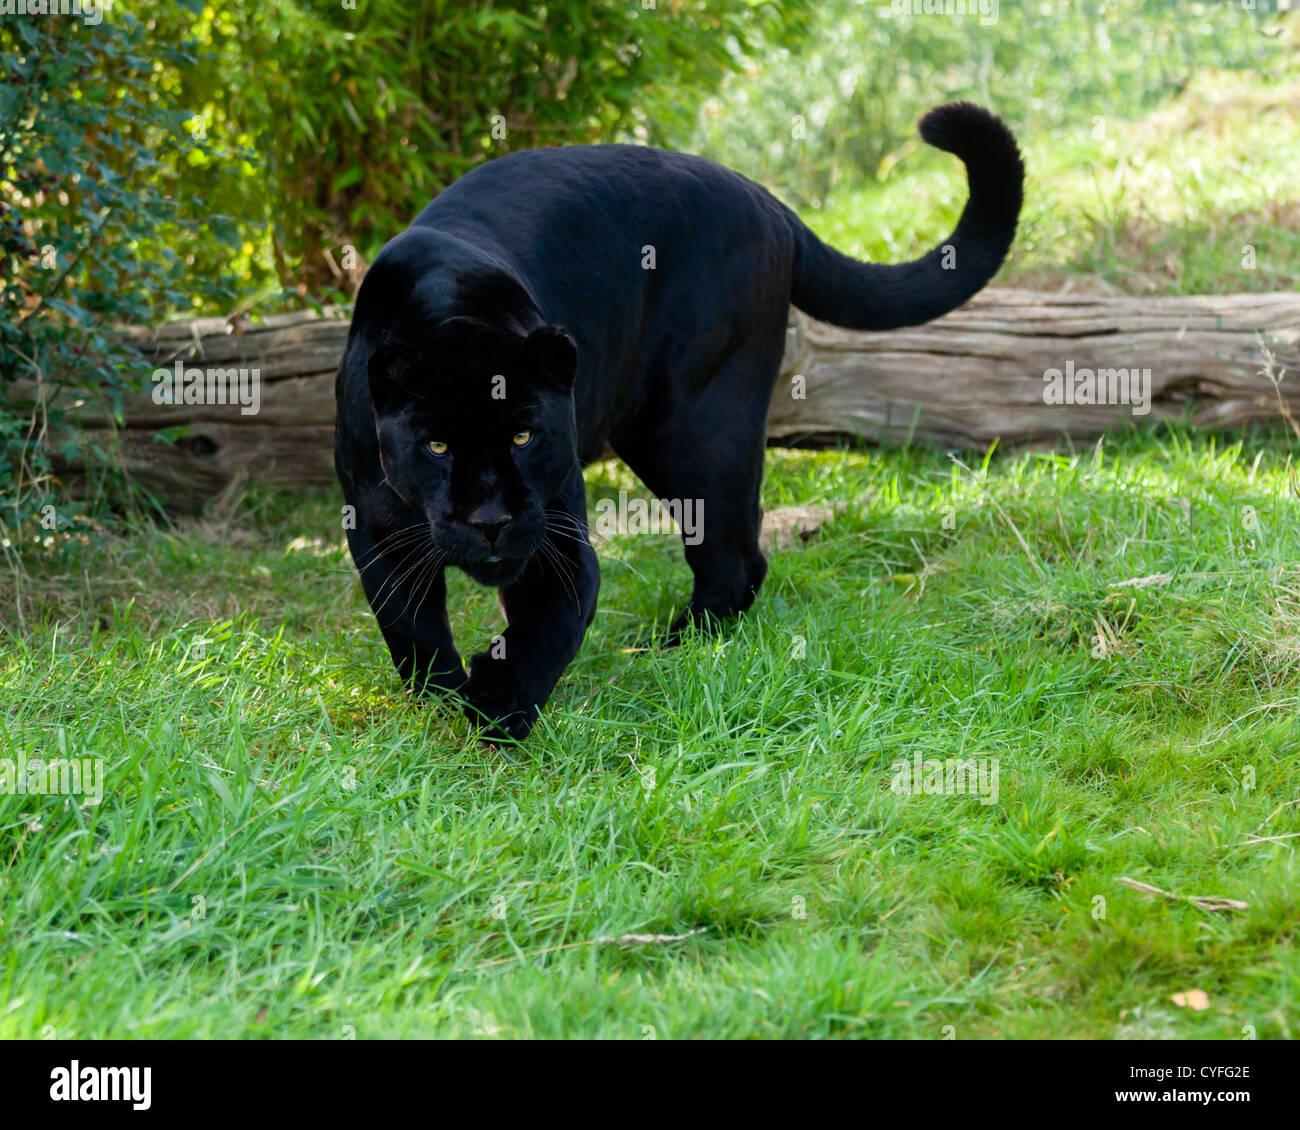 Black Jaguar Growl: Black Jaguar Animal Stock Photos & Black Jaguar Animal